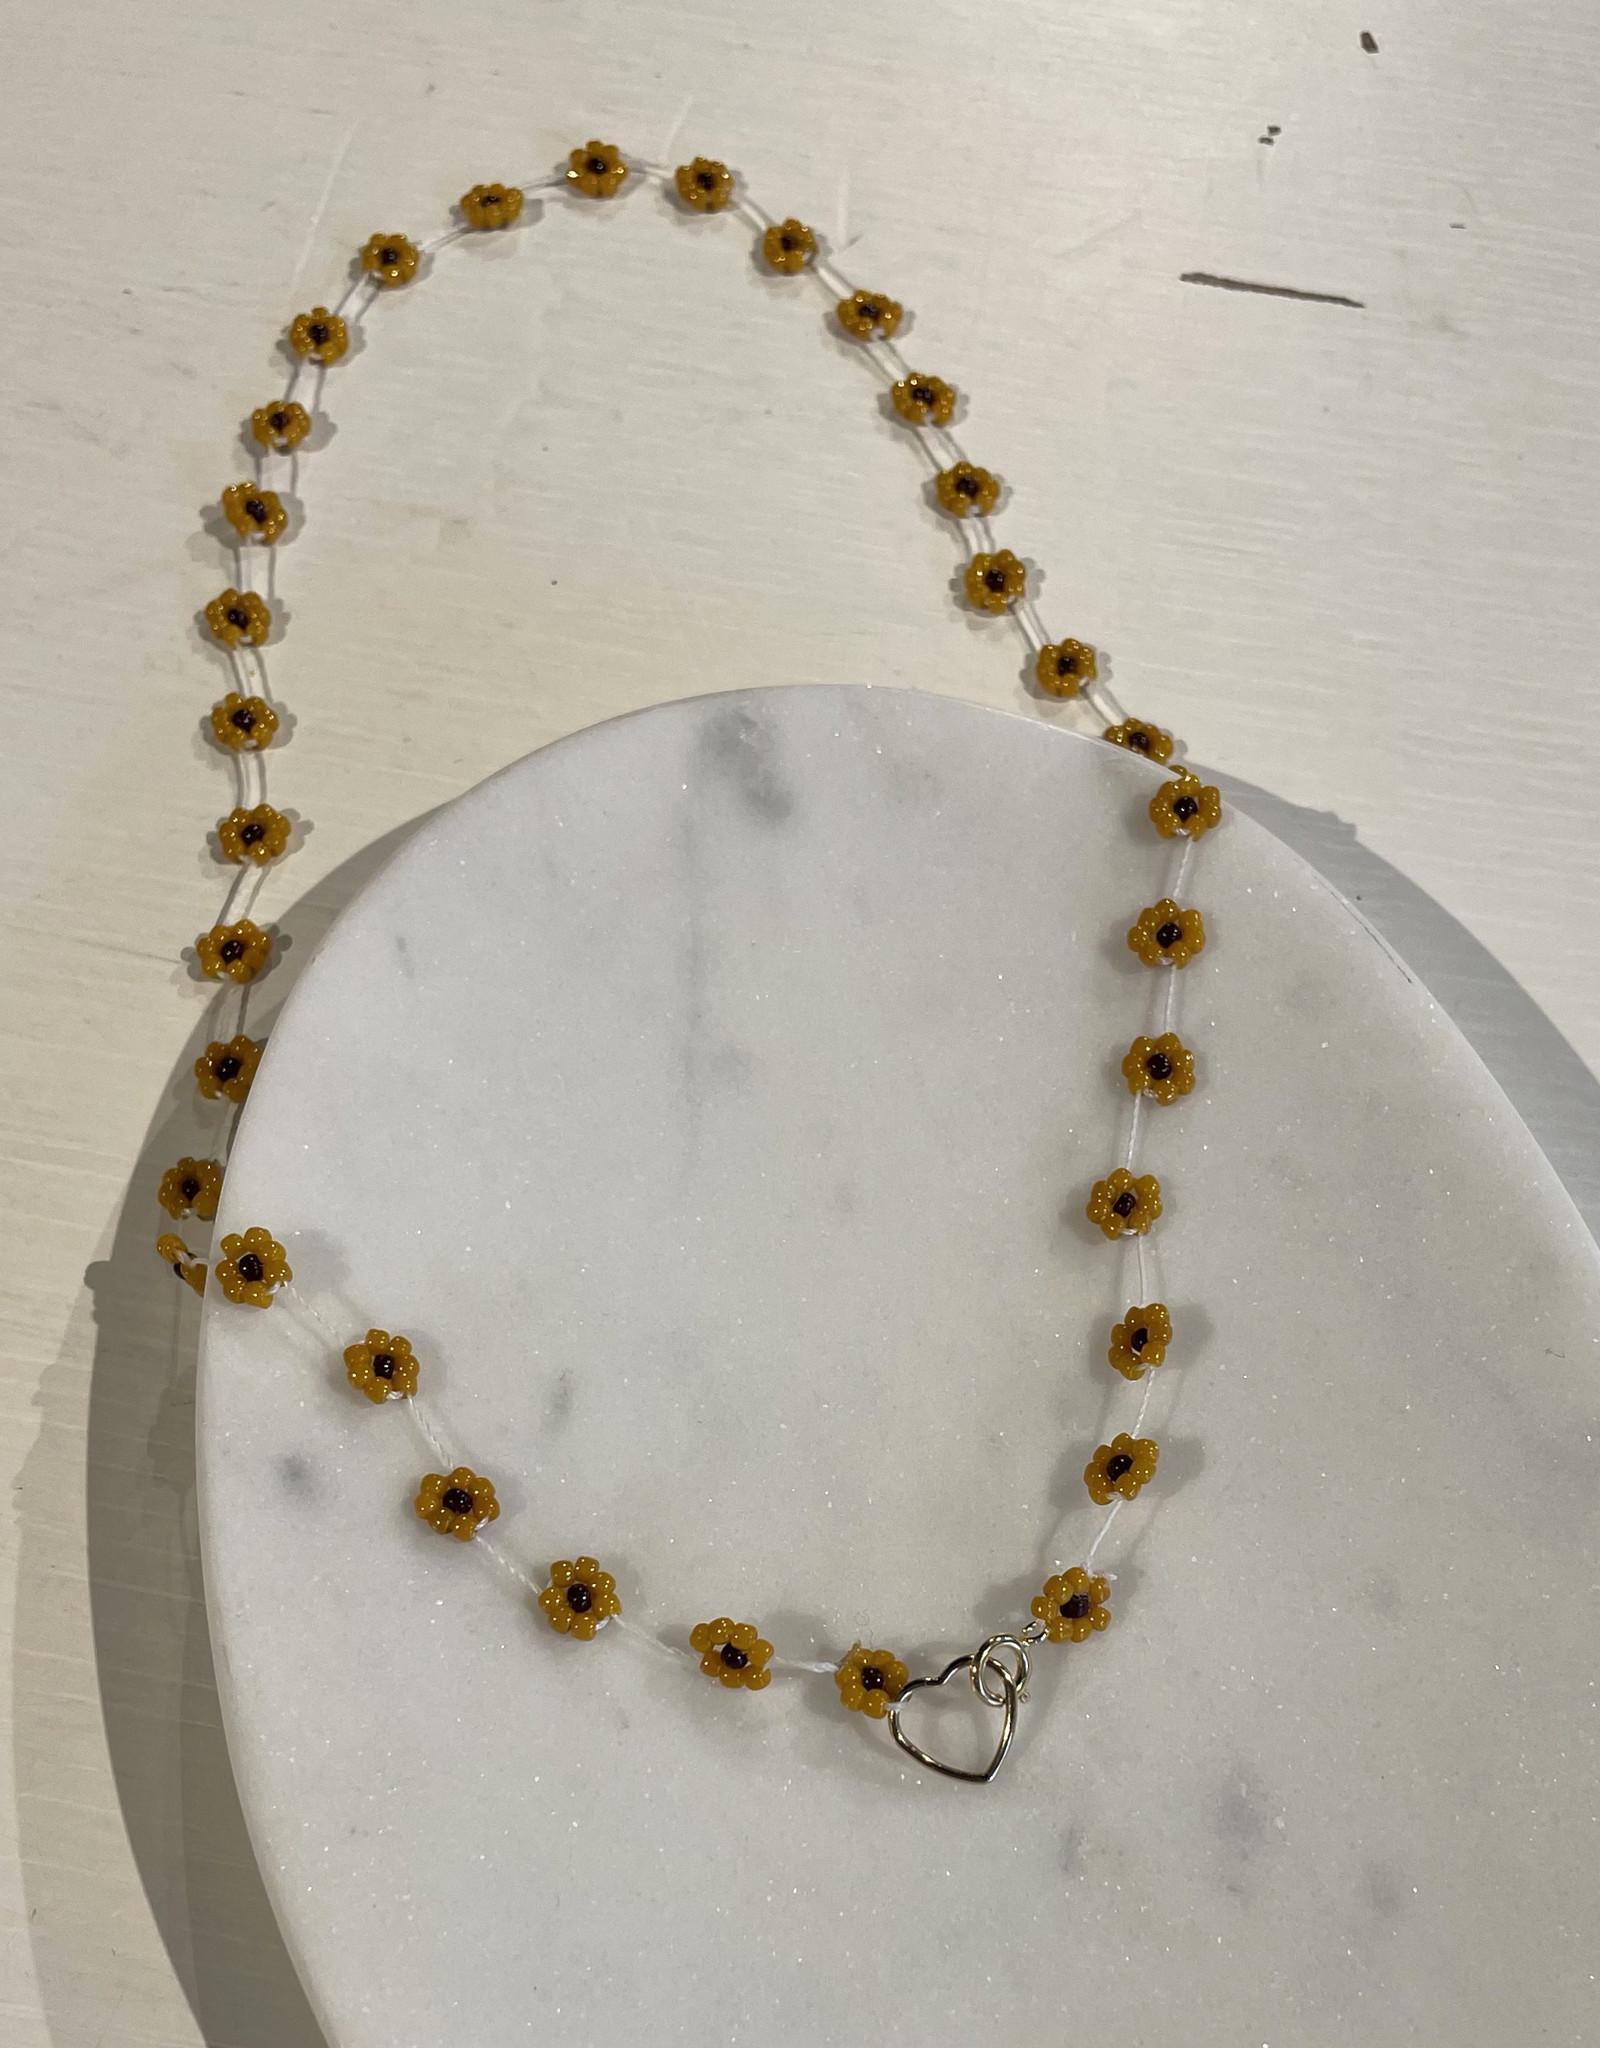 Atelier Labro Fiori Necklace Tuscan Orange